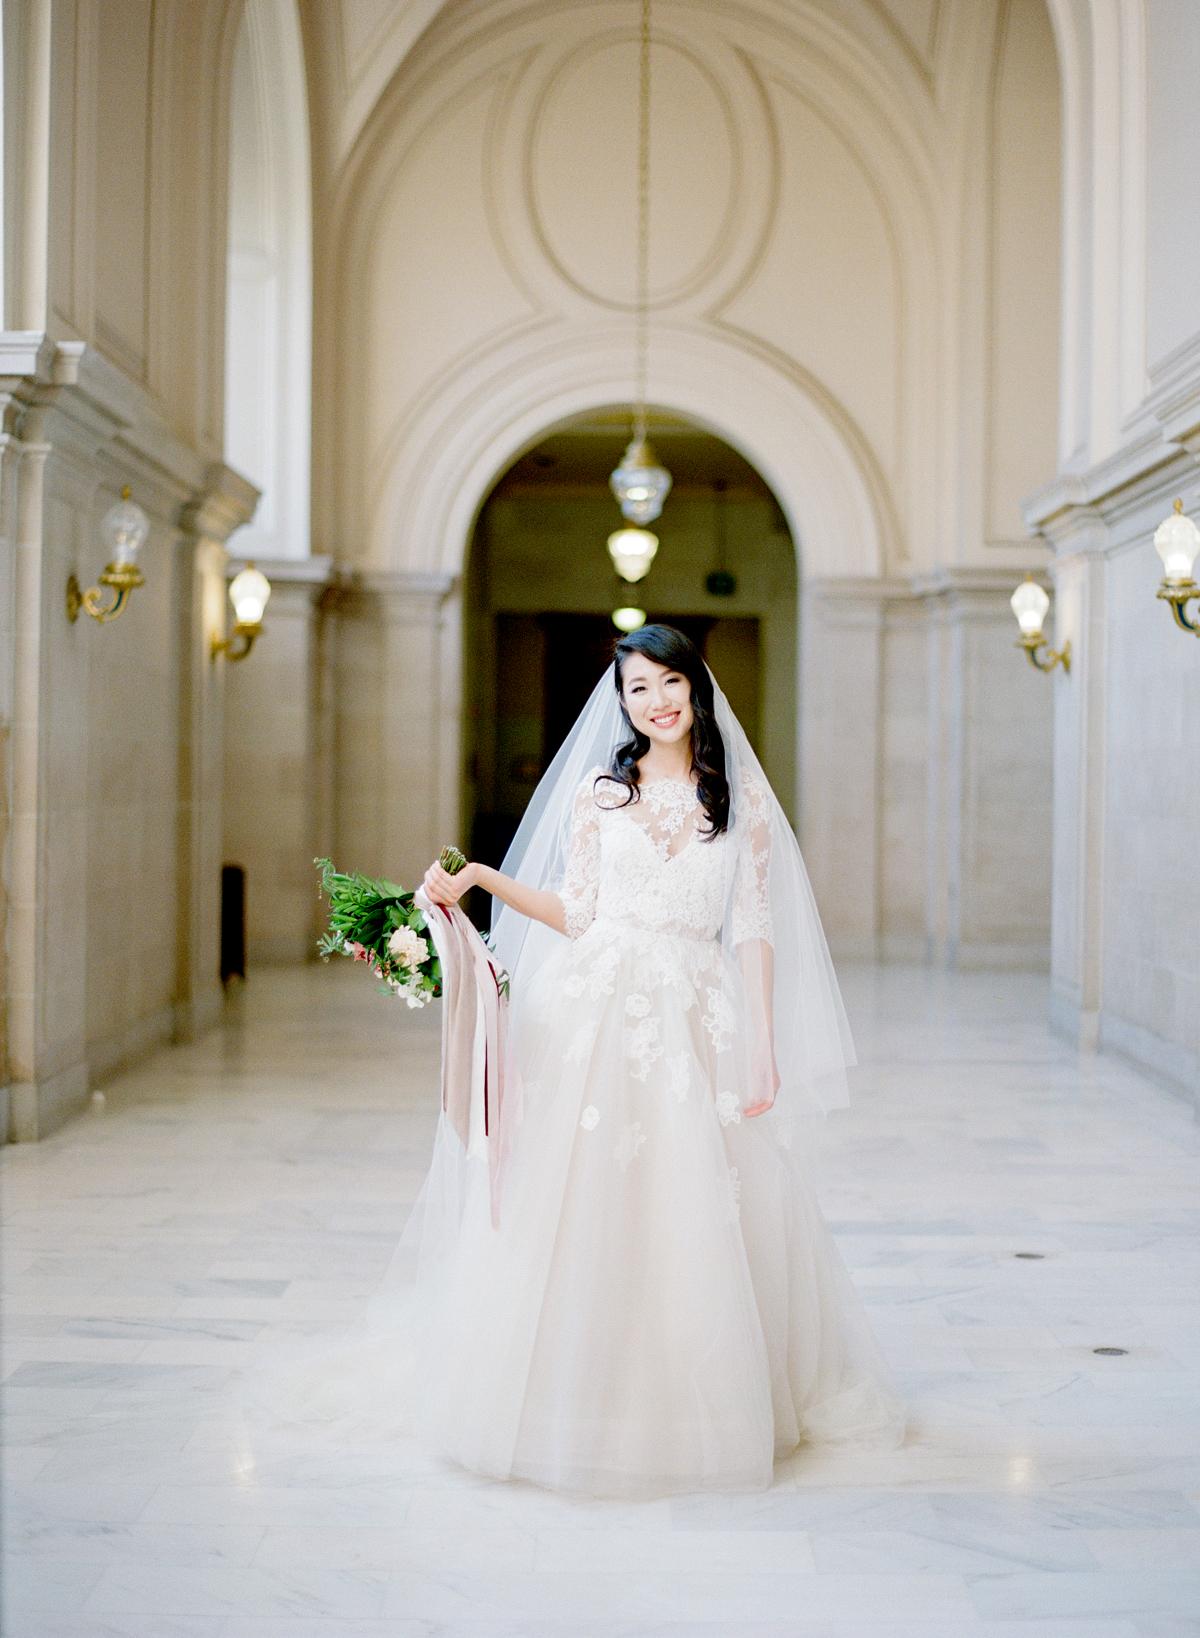 bride wearing Monique Lhuillier wedding dress to city hall venue